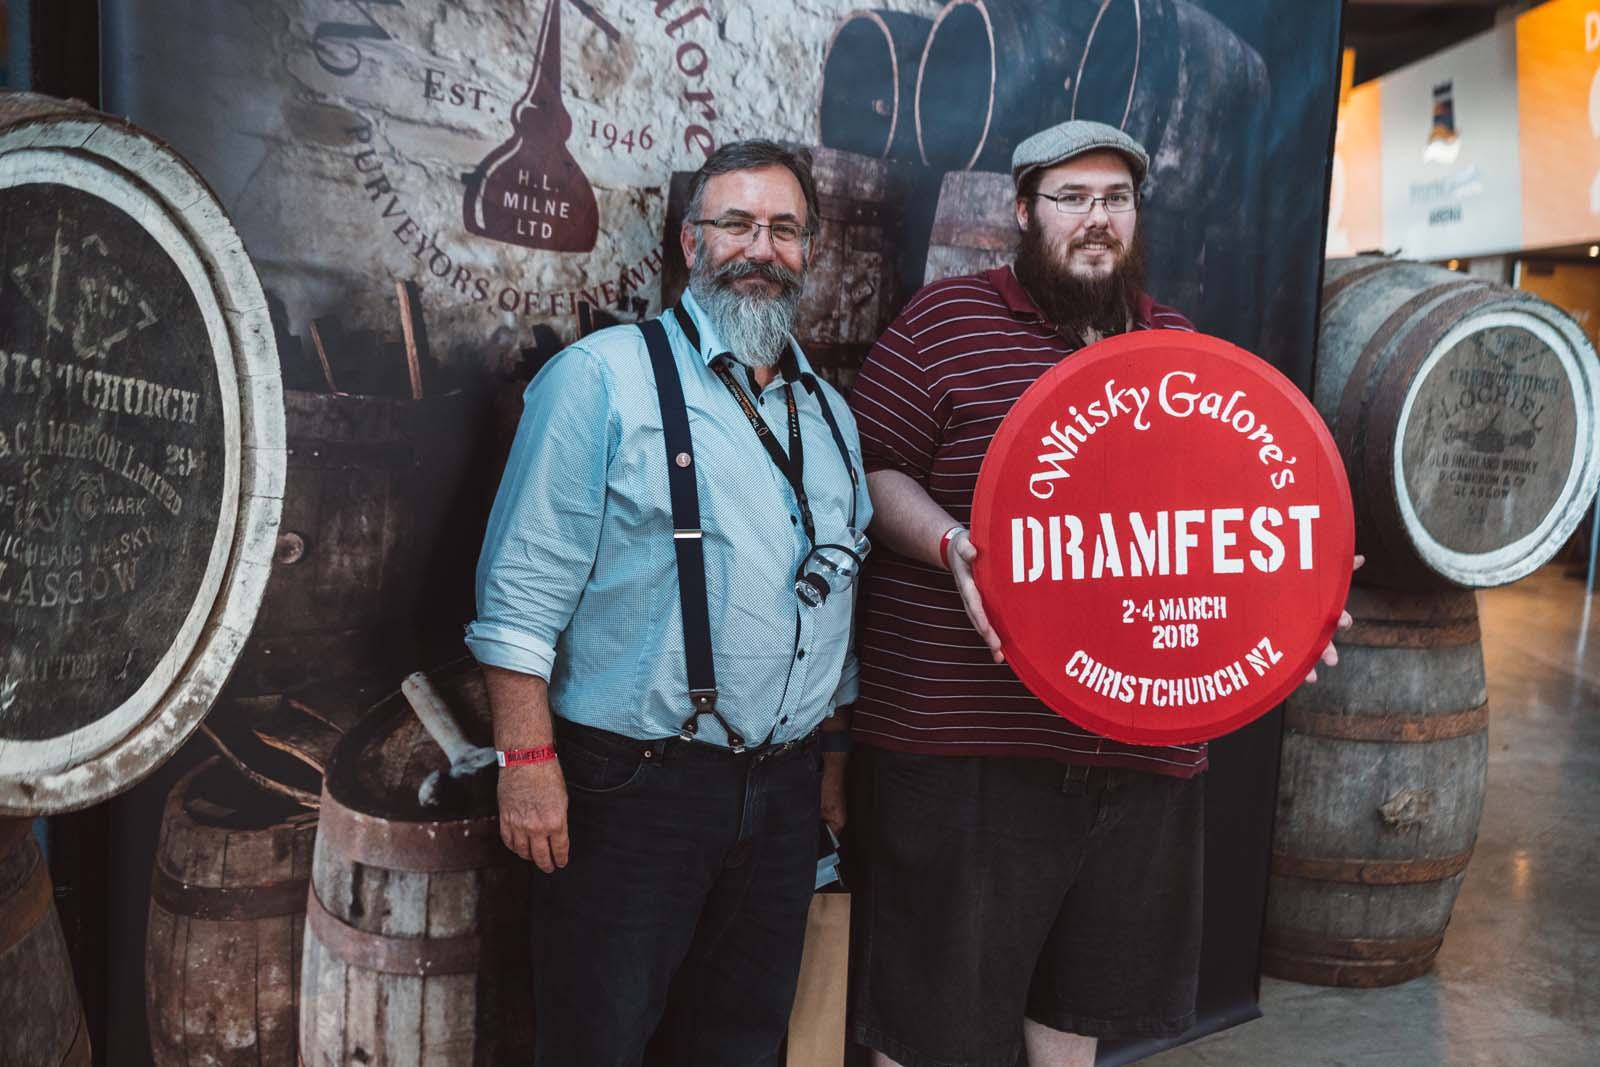 Dramfest 2018 for Whisky Galore-135.jpg